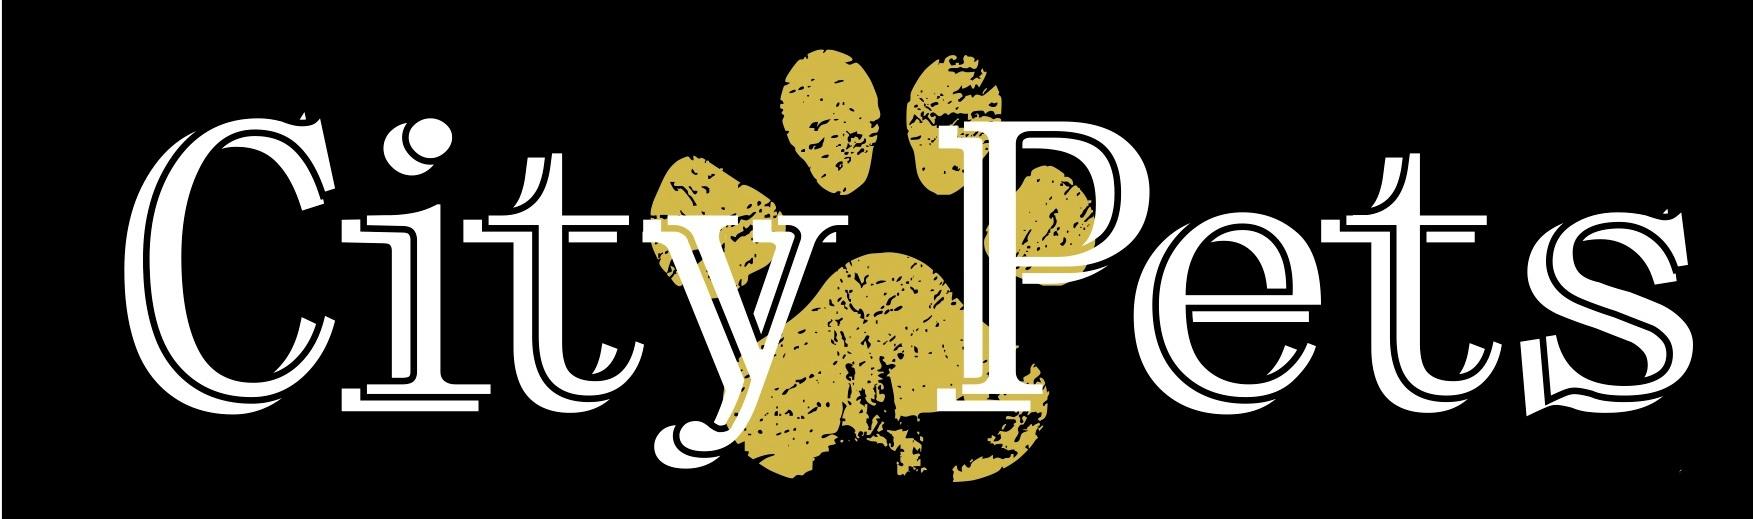 City+pets+banner.jpg